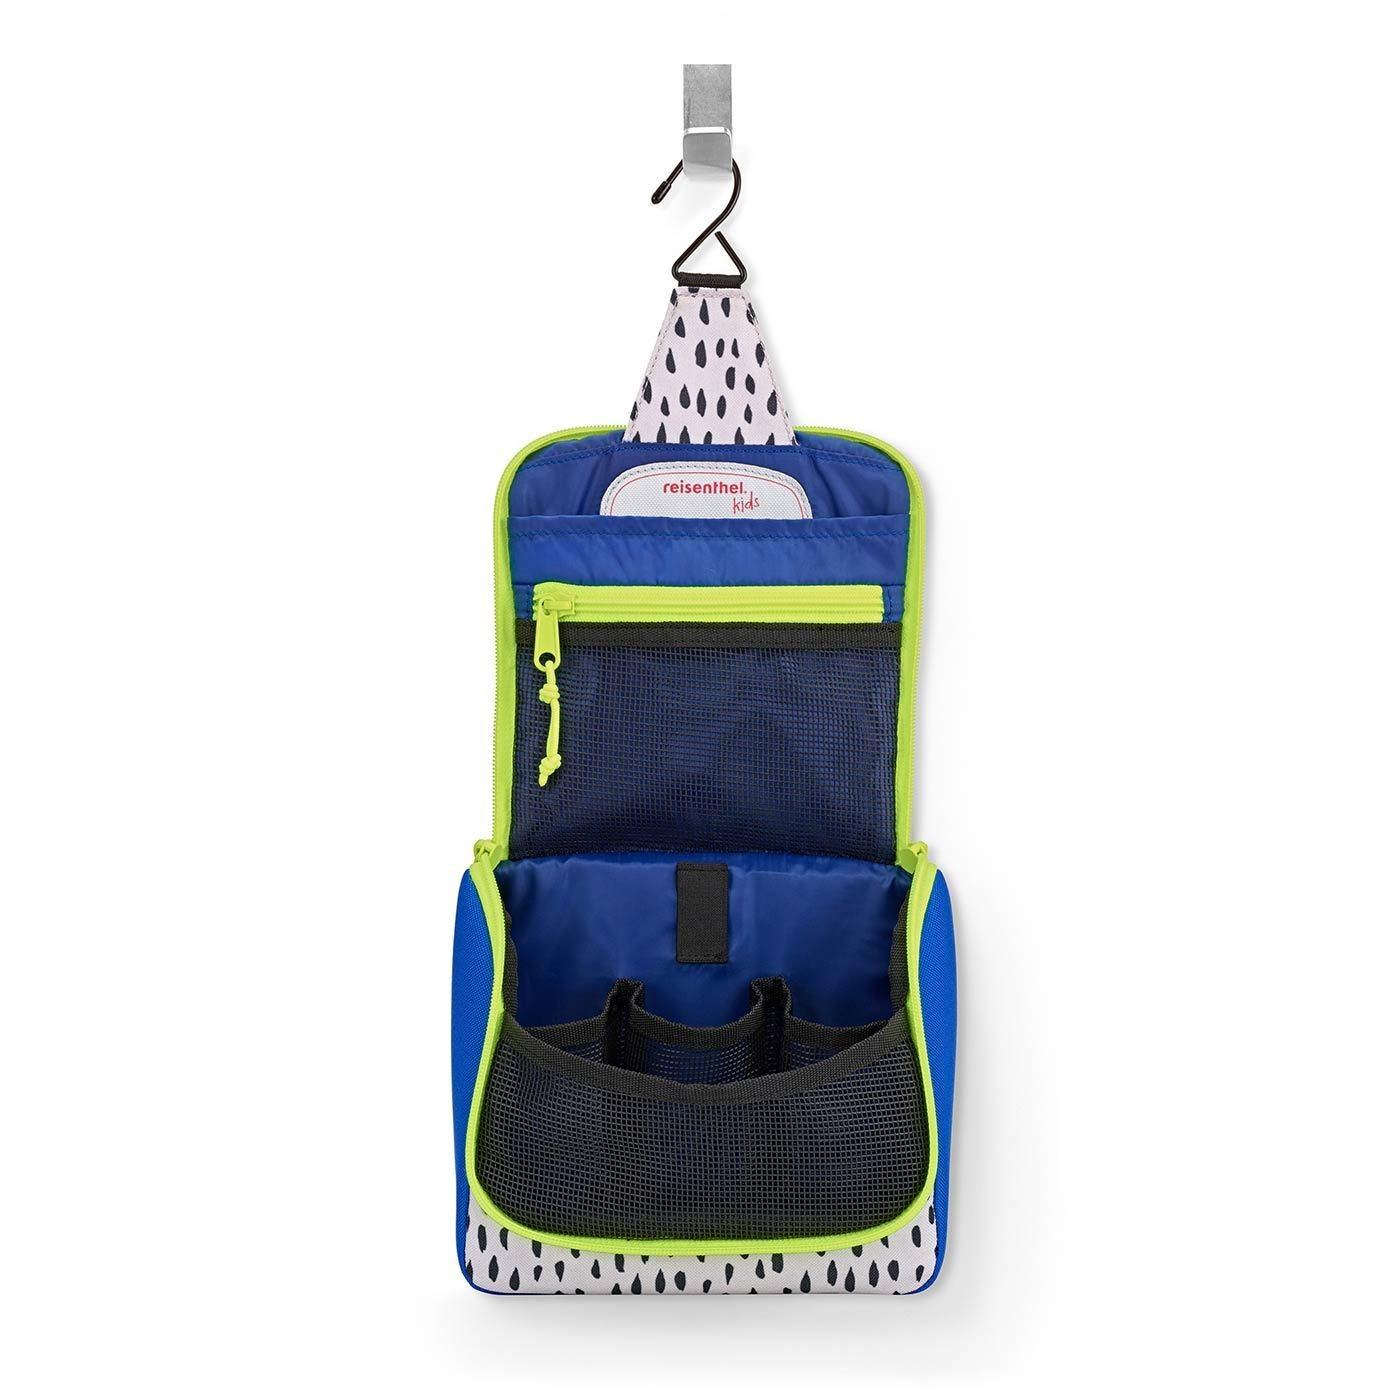 Kosmetická taška Toiletbag S kids mini me leo_0